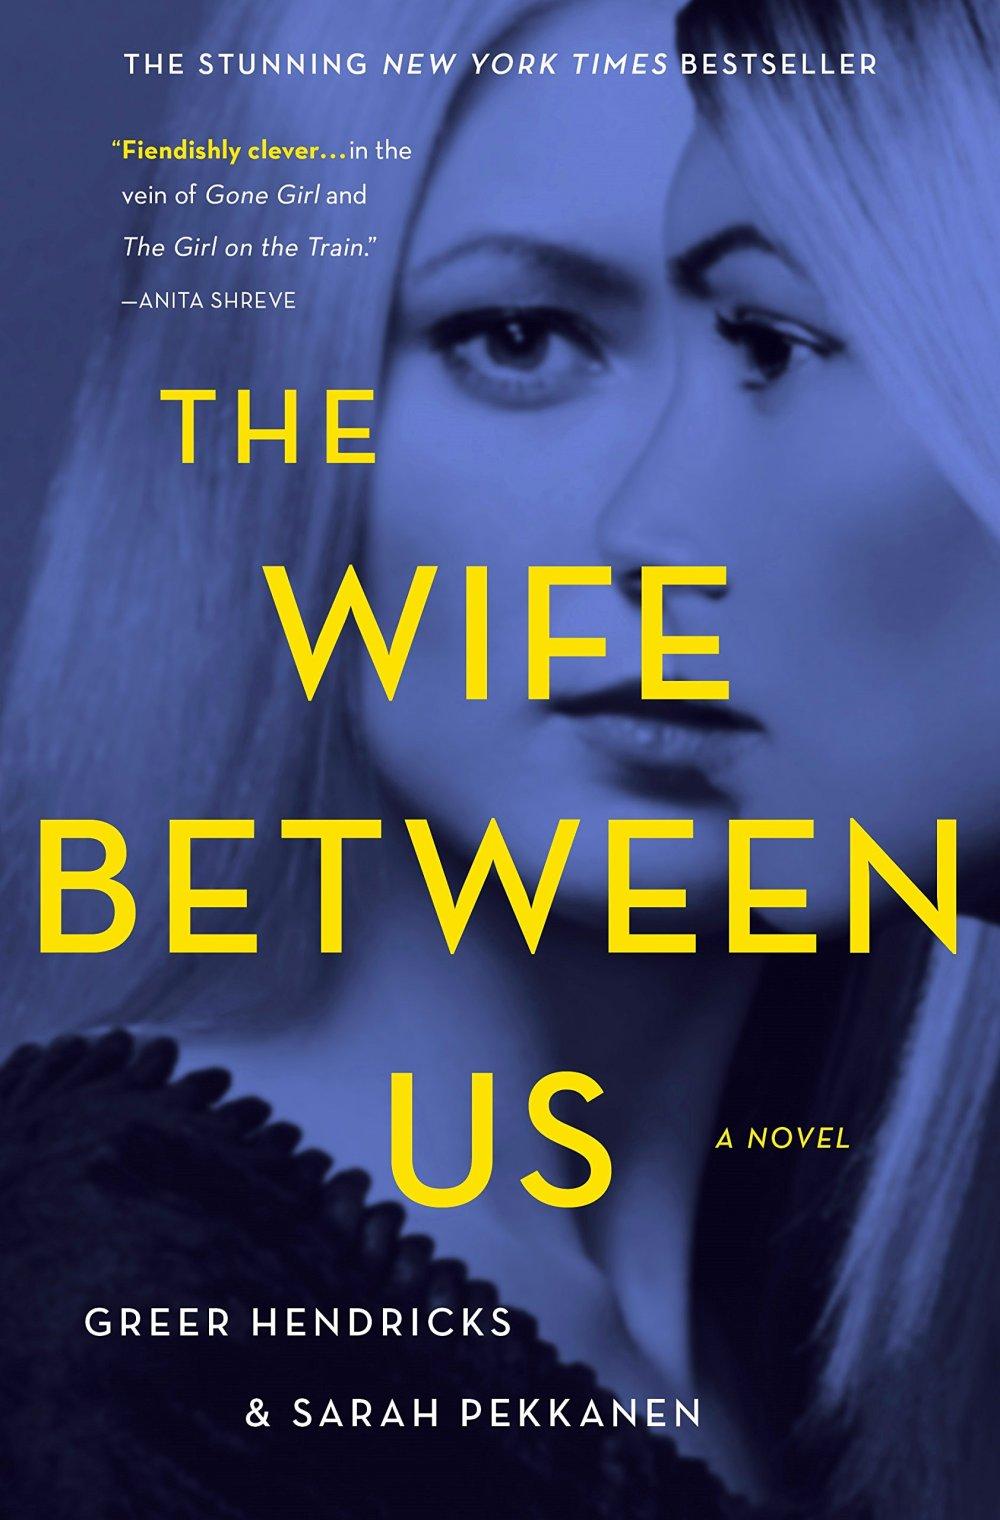 6. The Wife Between Us by Greer Hendricks and Sarah Pekkanen (2018)